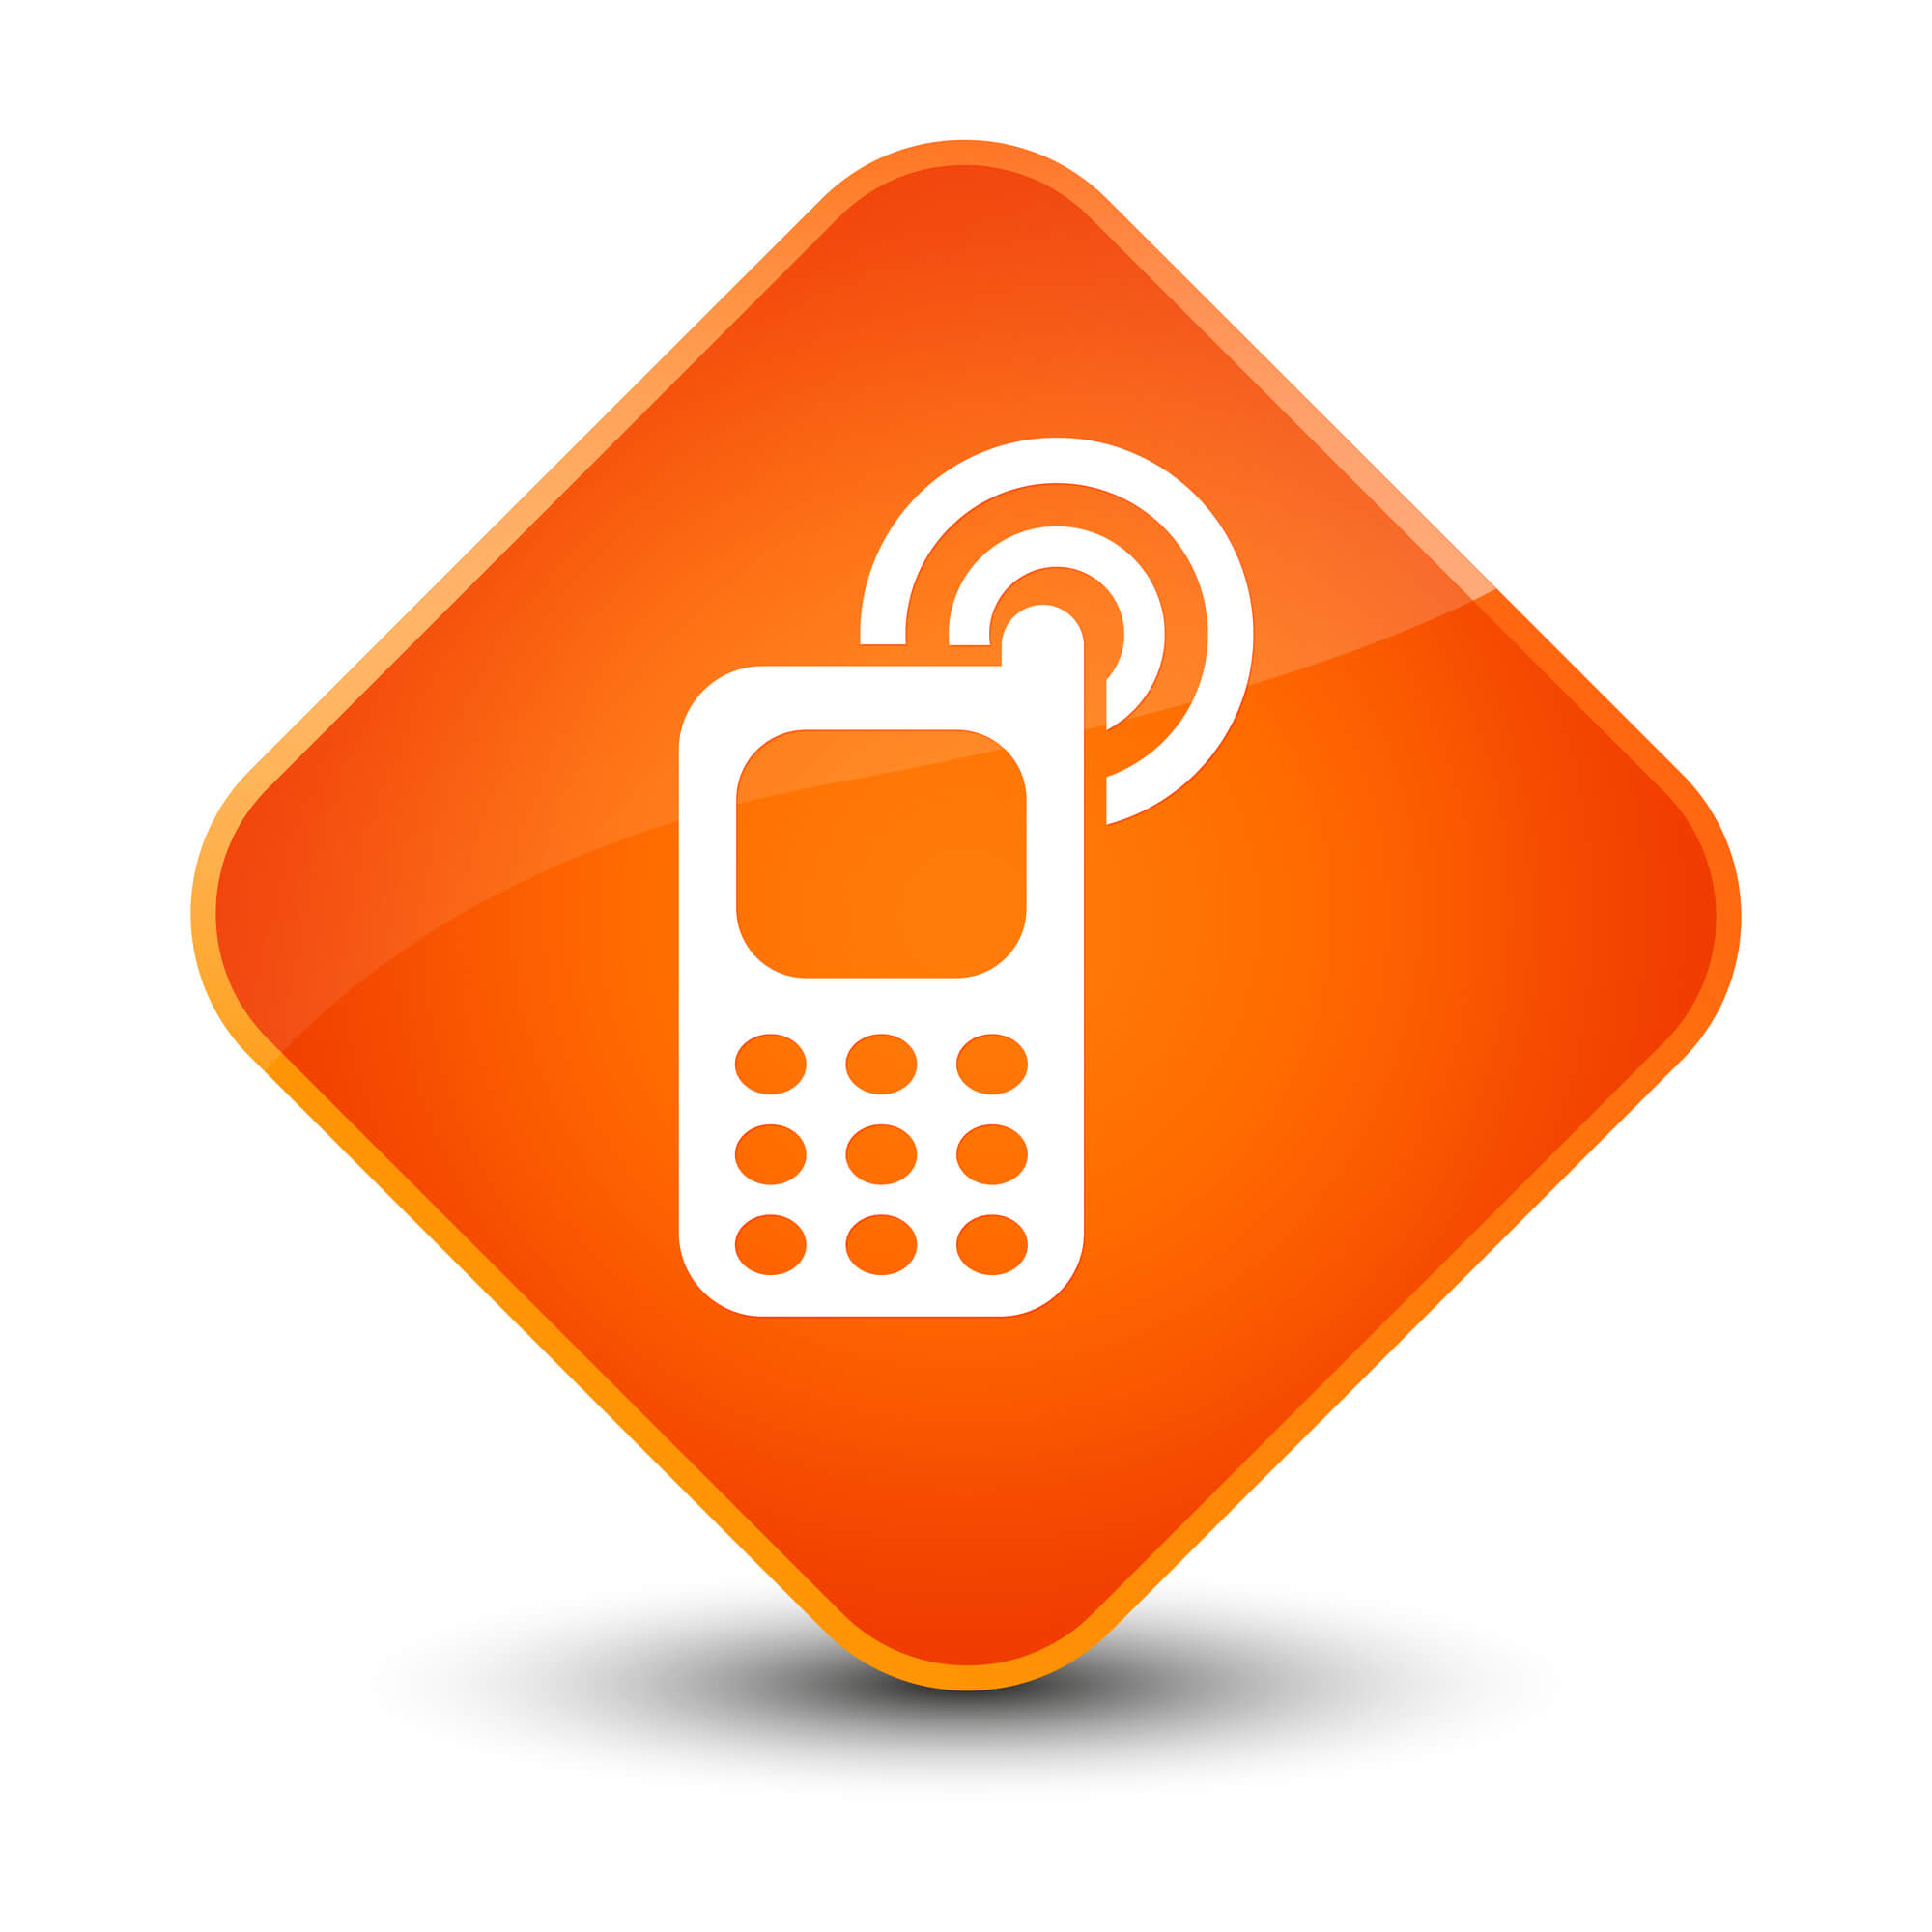 Komórka telefon